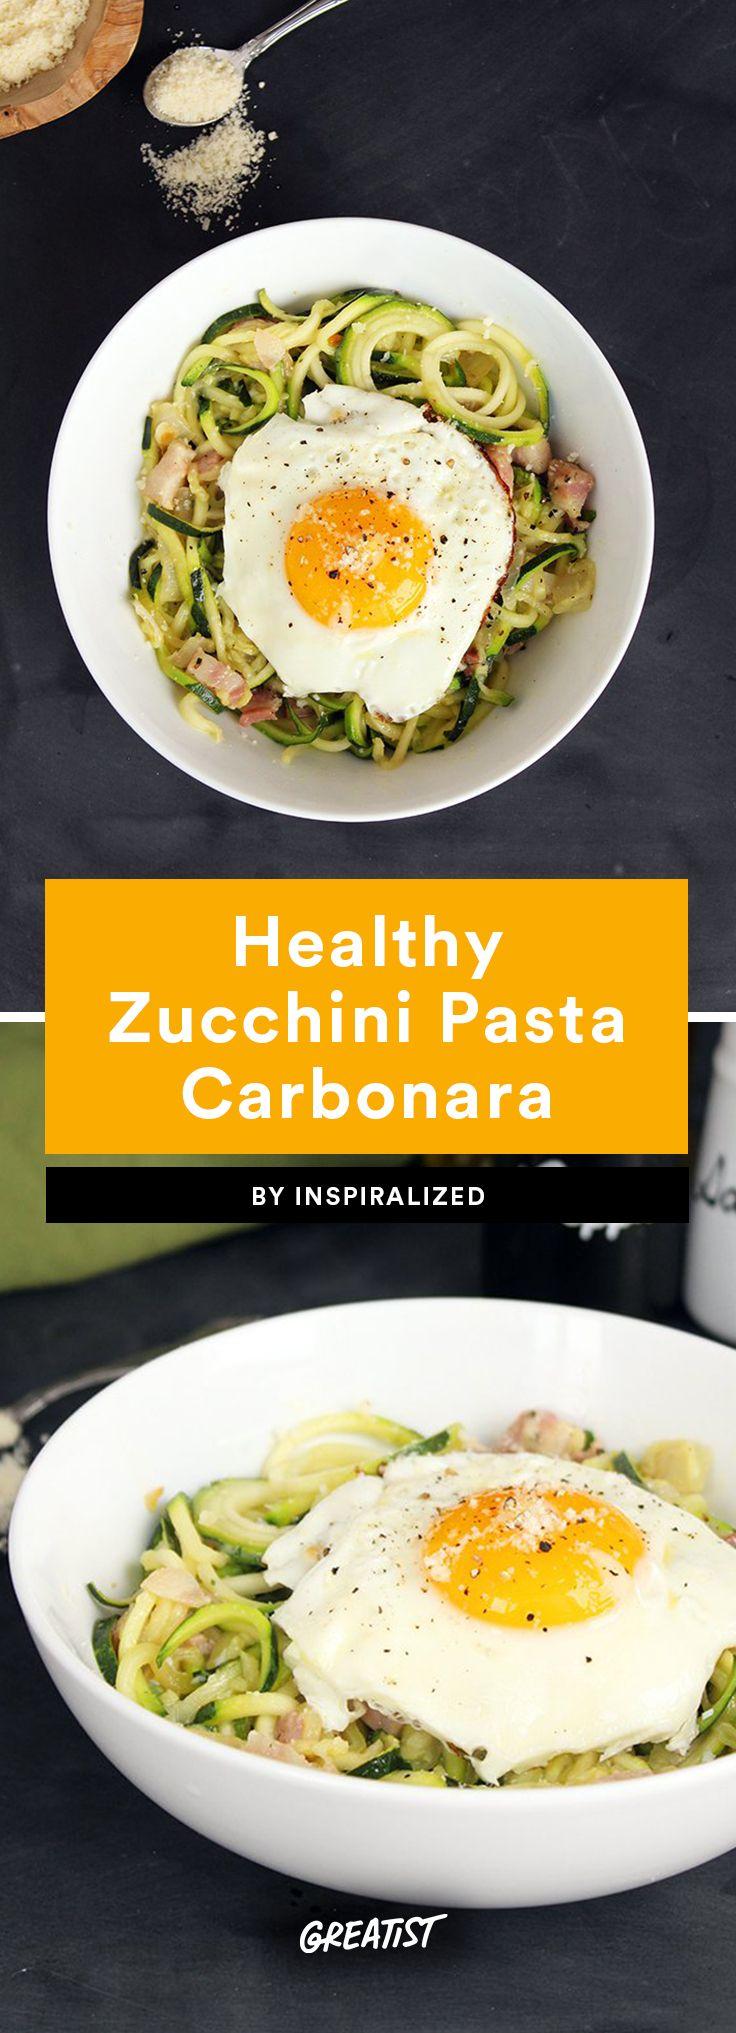 3. Healthy Zucchini Pasta Carbonara #healthy #recipes #zucchini https://greatist.com/eat/healthy-zucchini-noodle-recipes